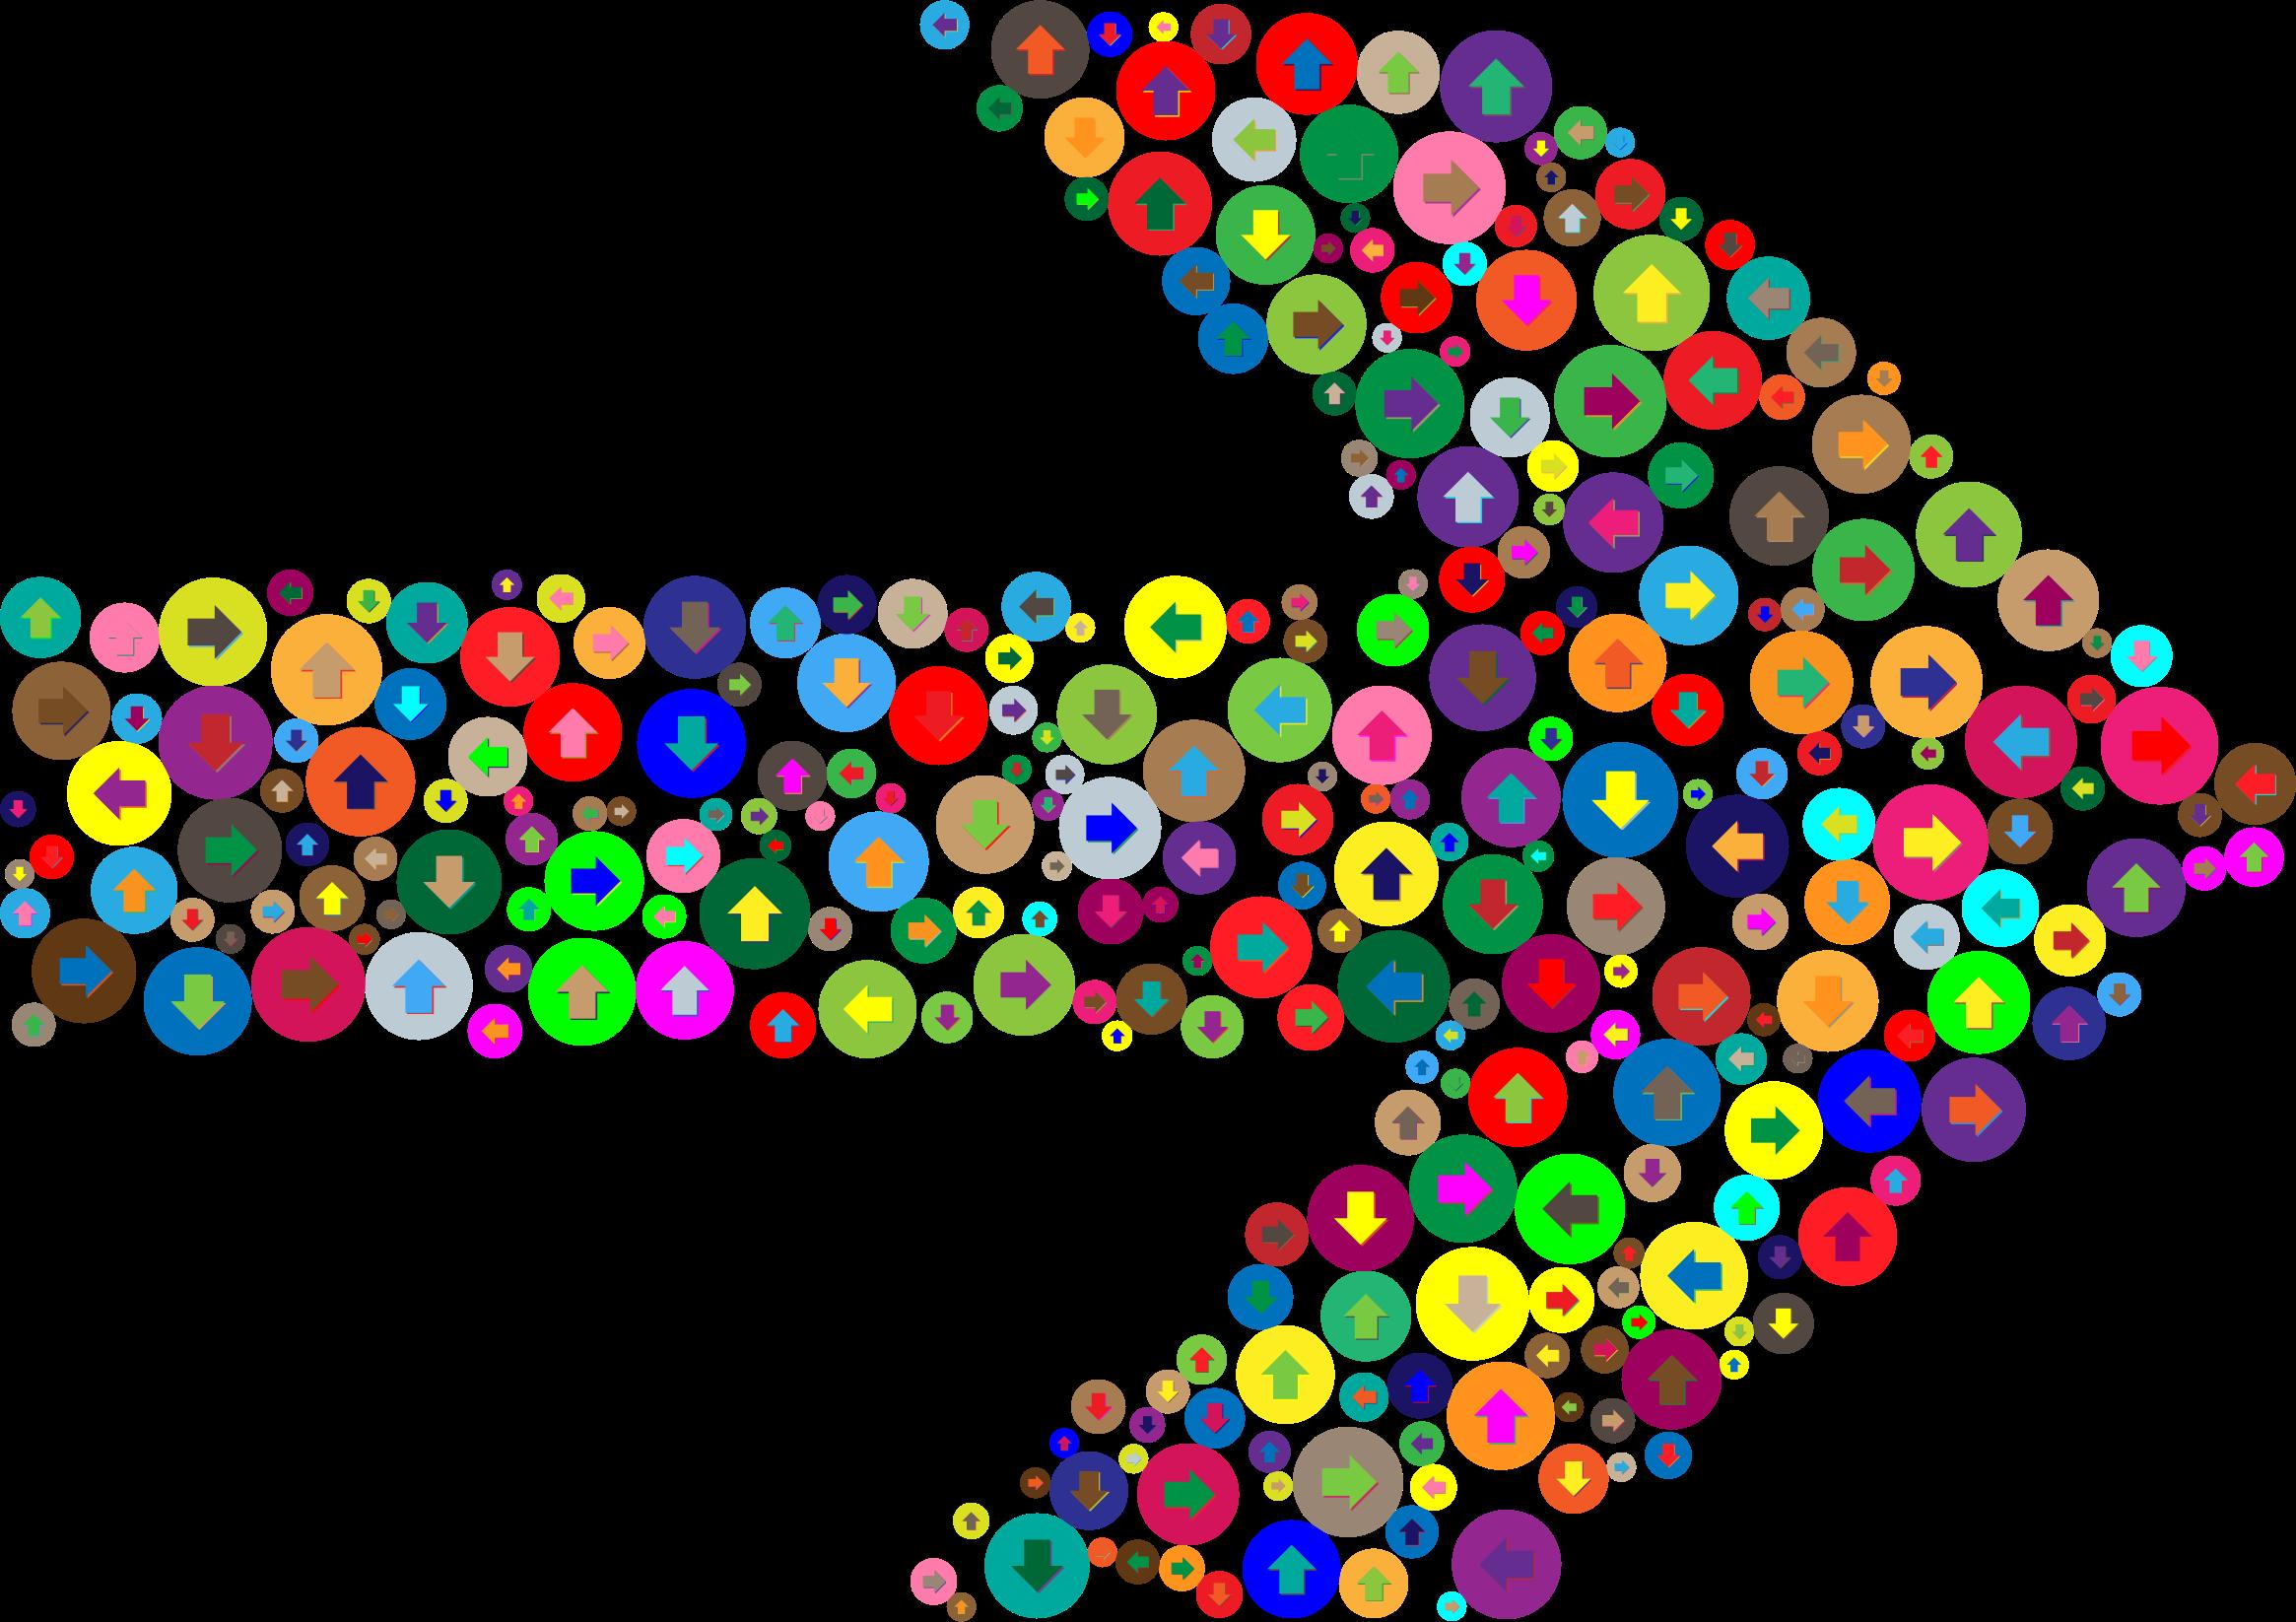 Colorful confusion big image. Clipart arrow colourful